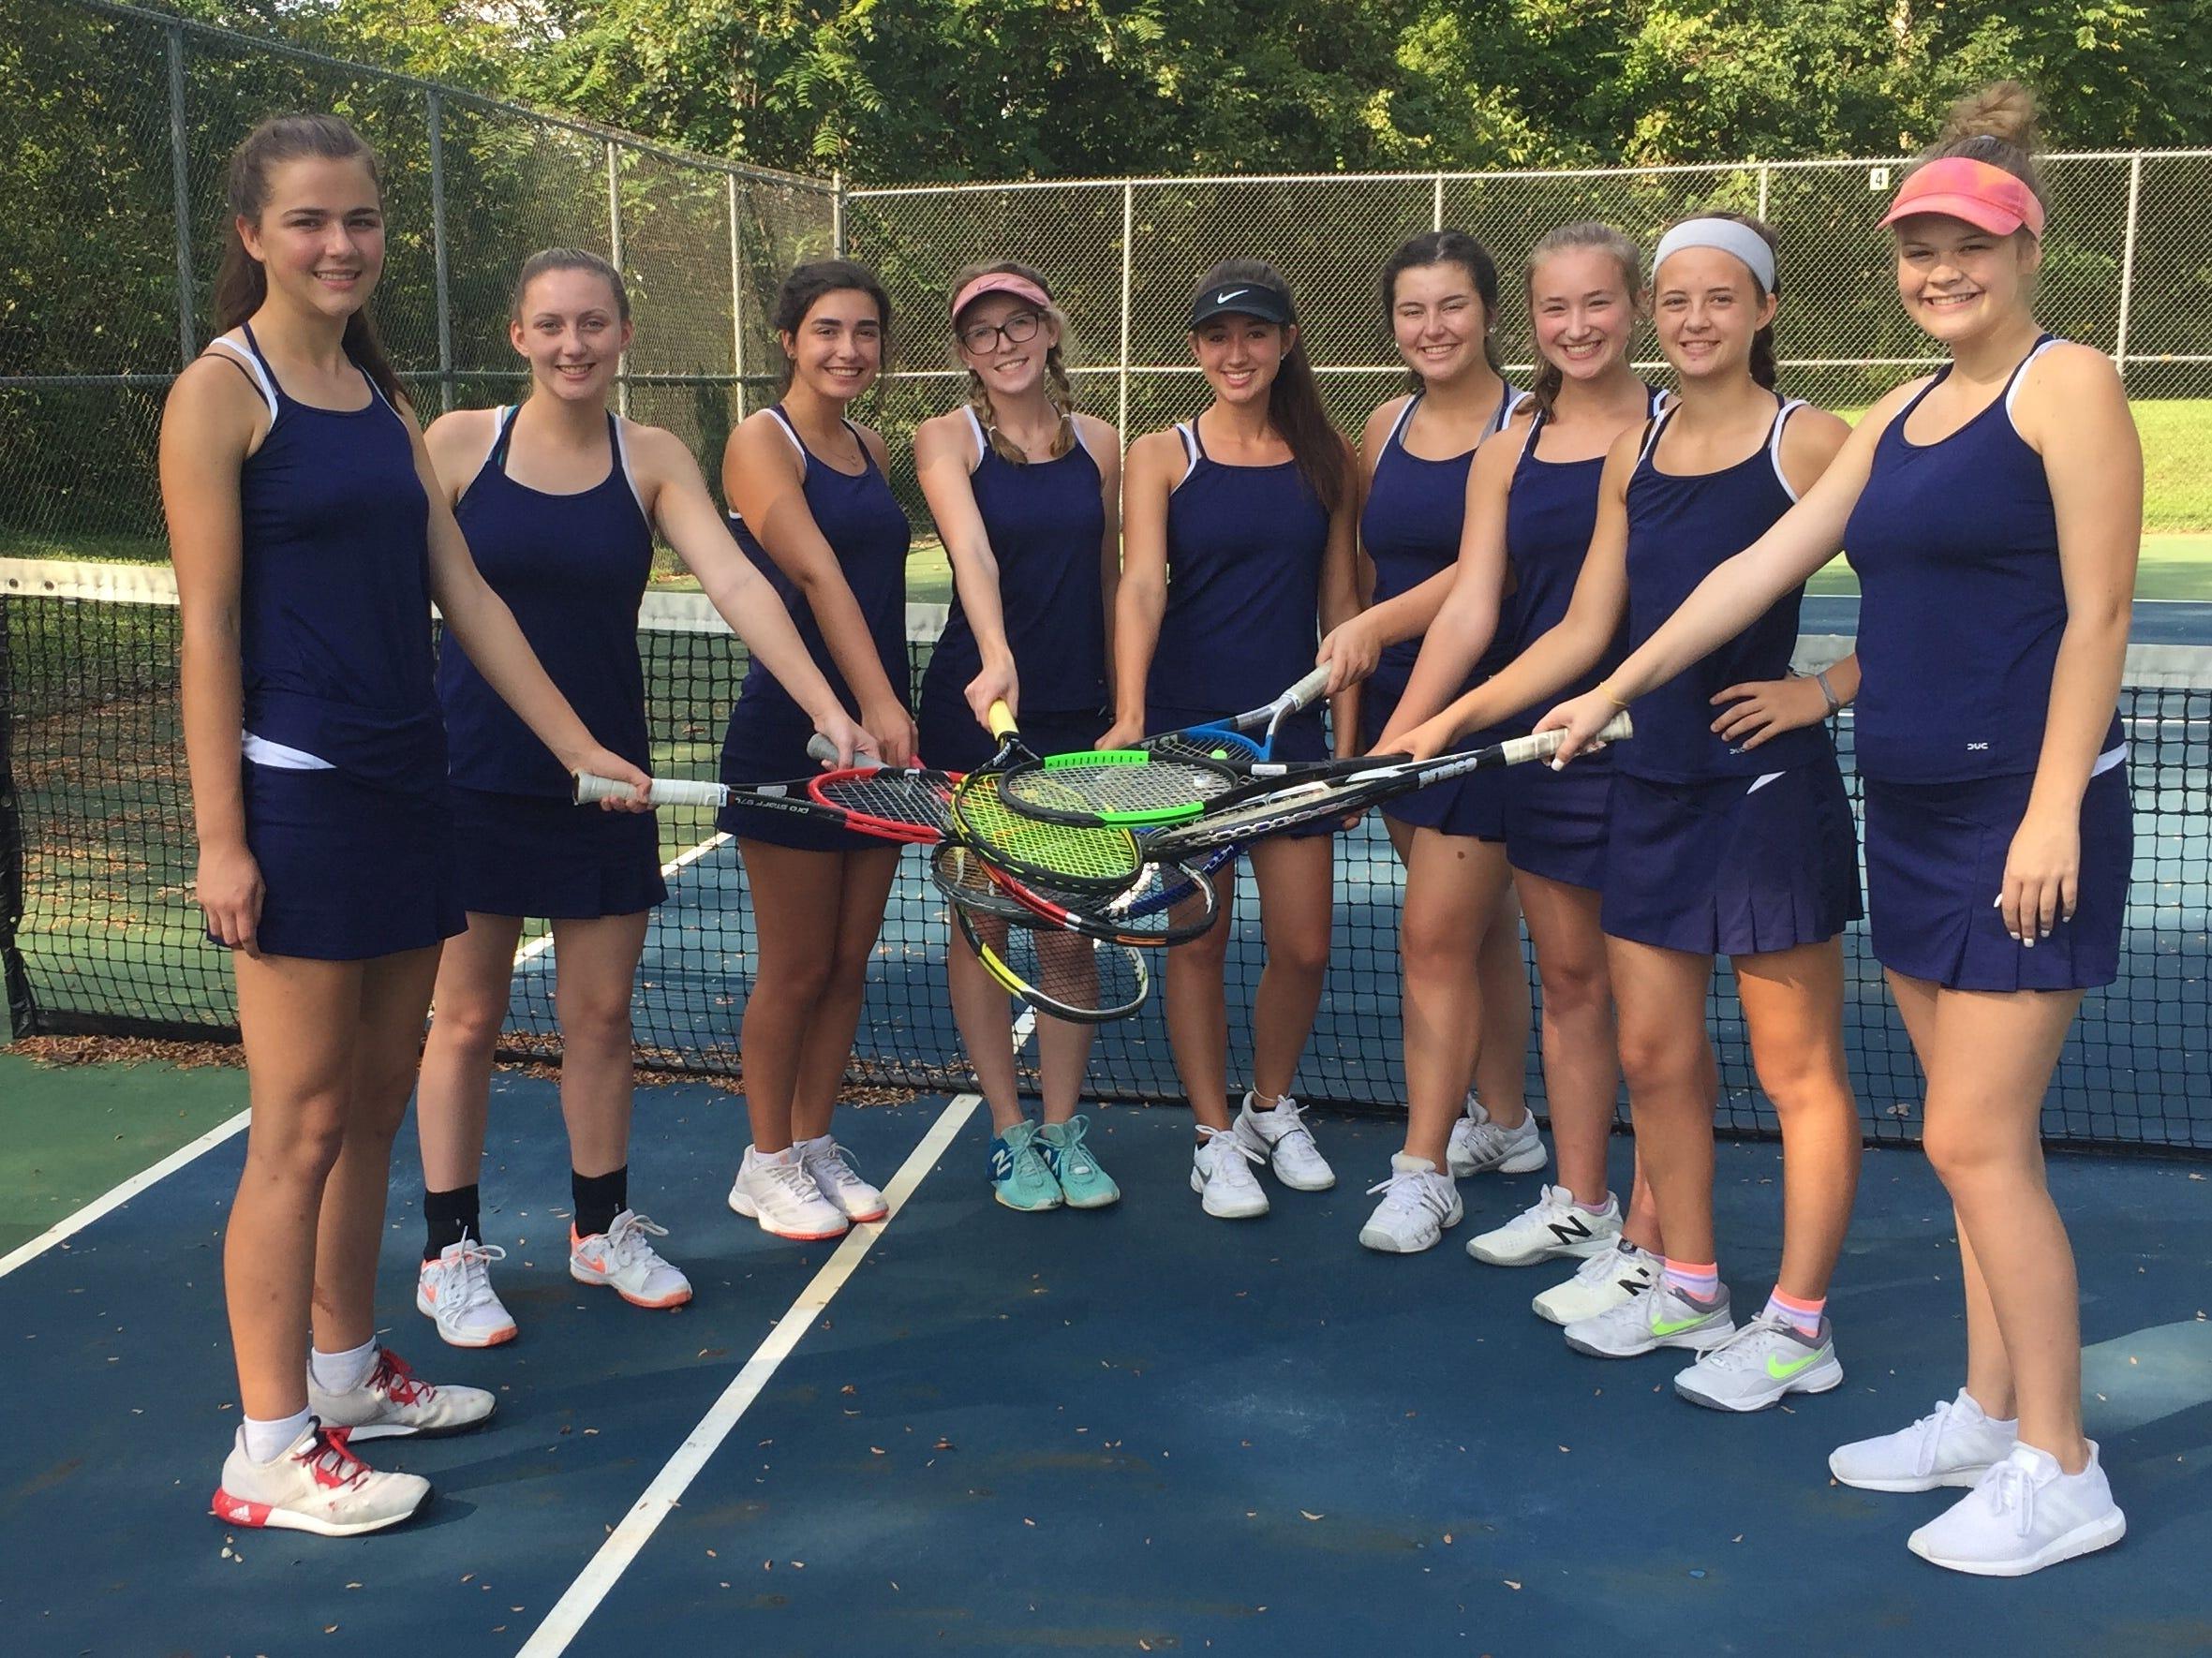 Lancaster Tennis